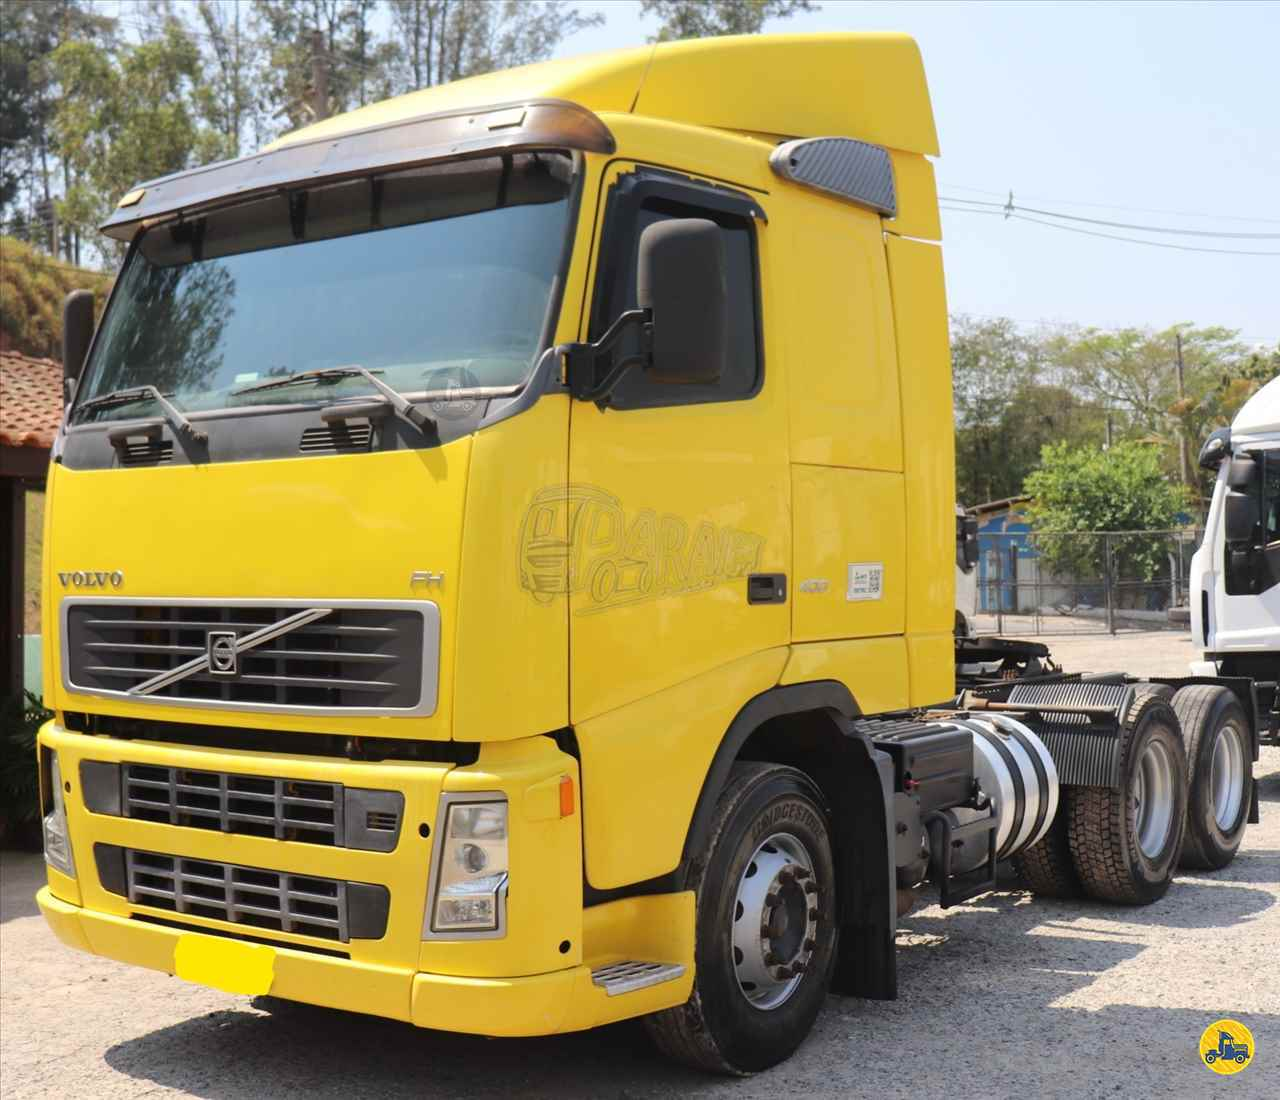 CAMINHAO VOLVO VOLVO FH 400 Chassis Truck 6x2 Paraíso Pesados ARACARIGUAMA SÃO PAULO SP